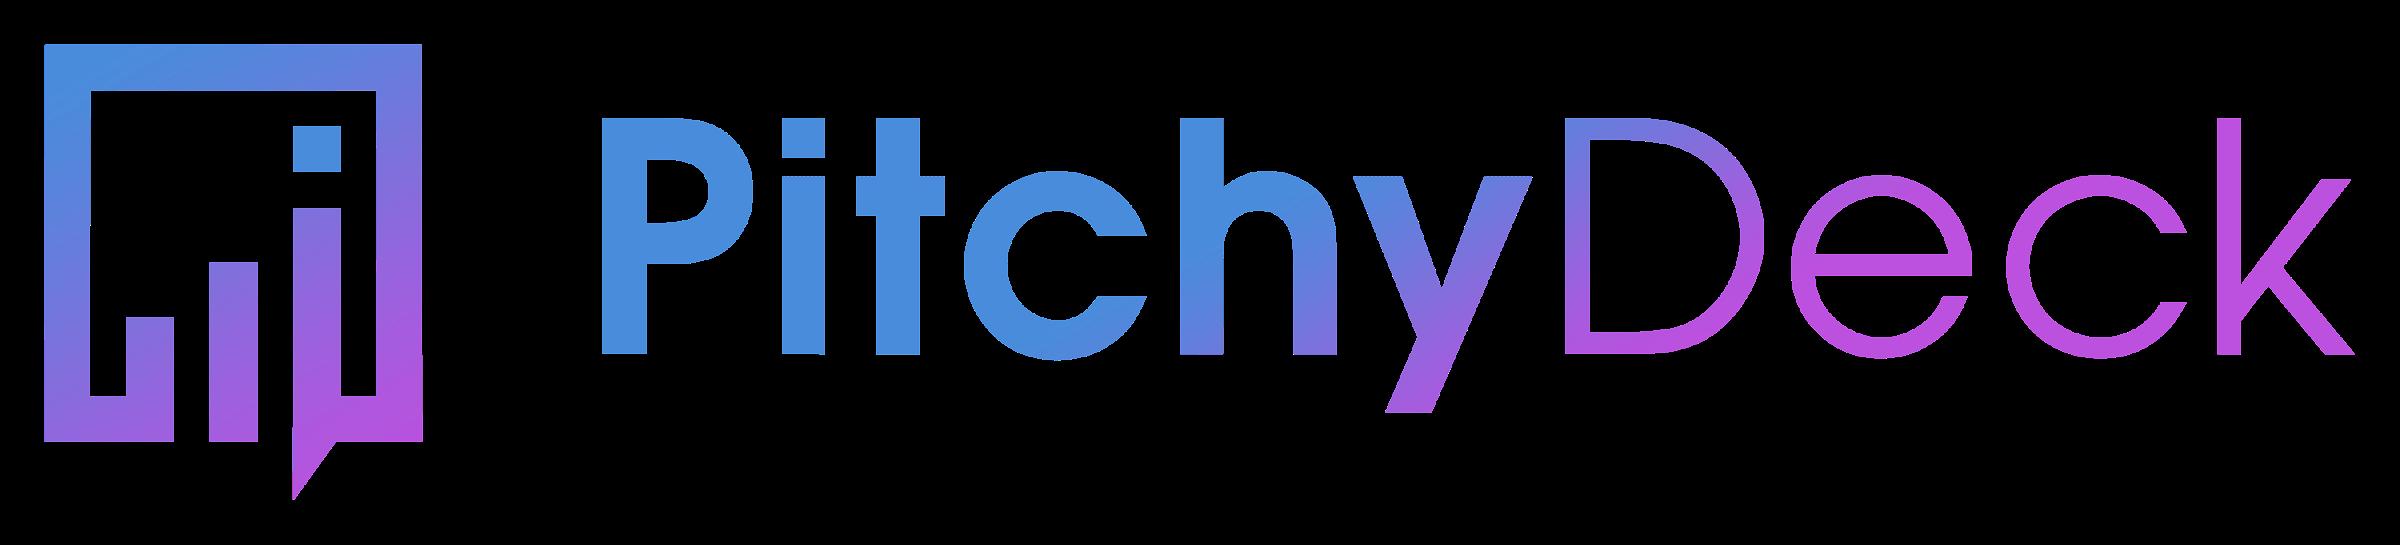 Pitchydeck